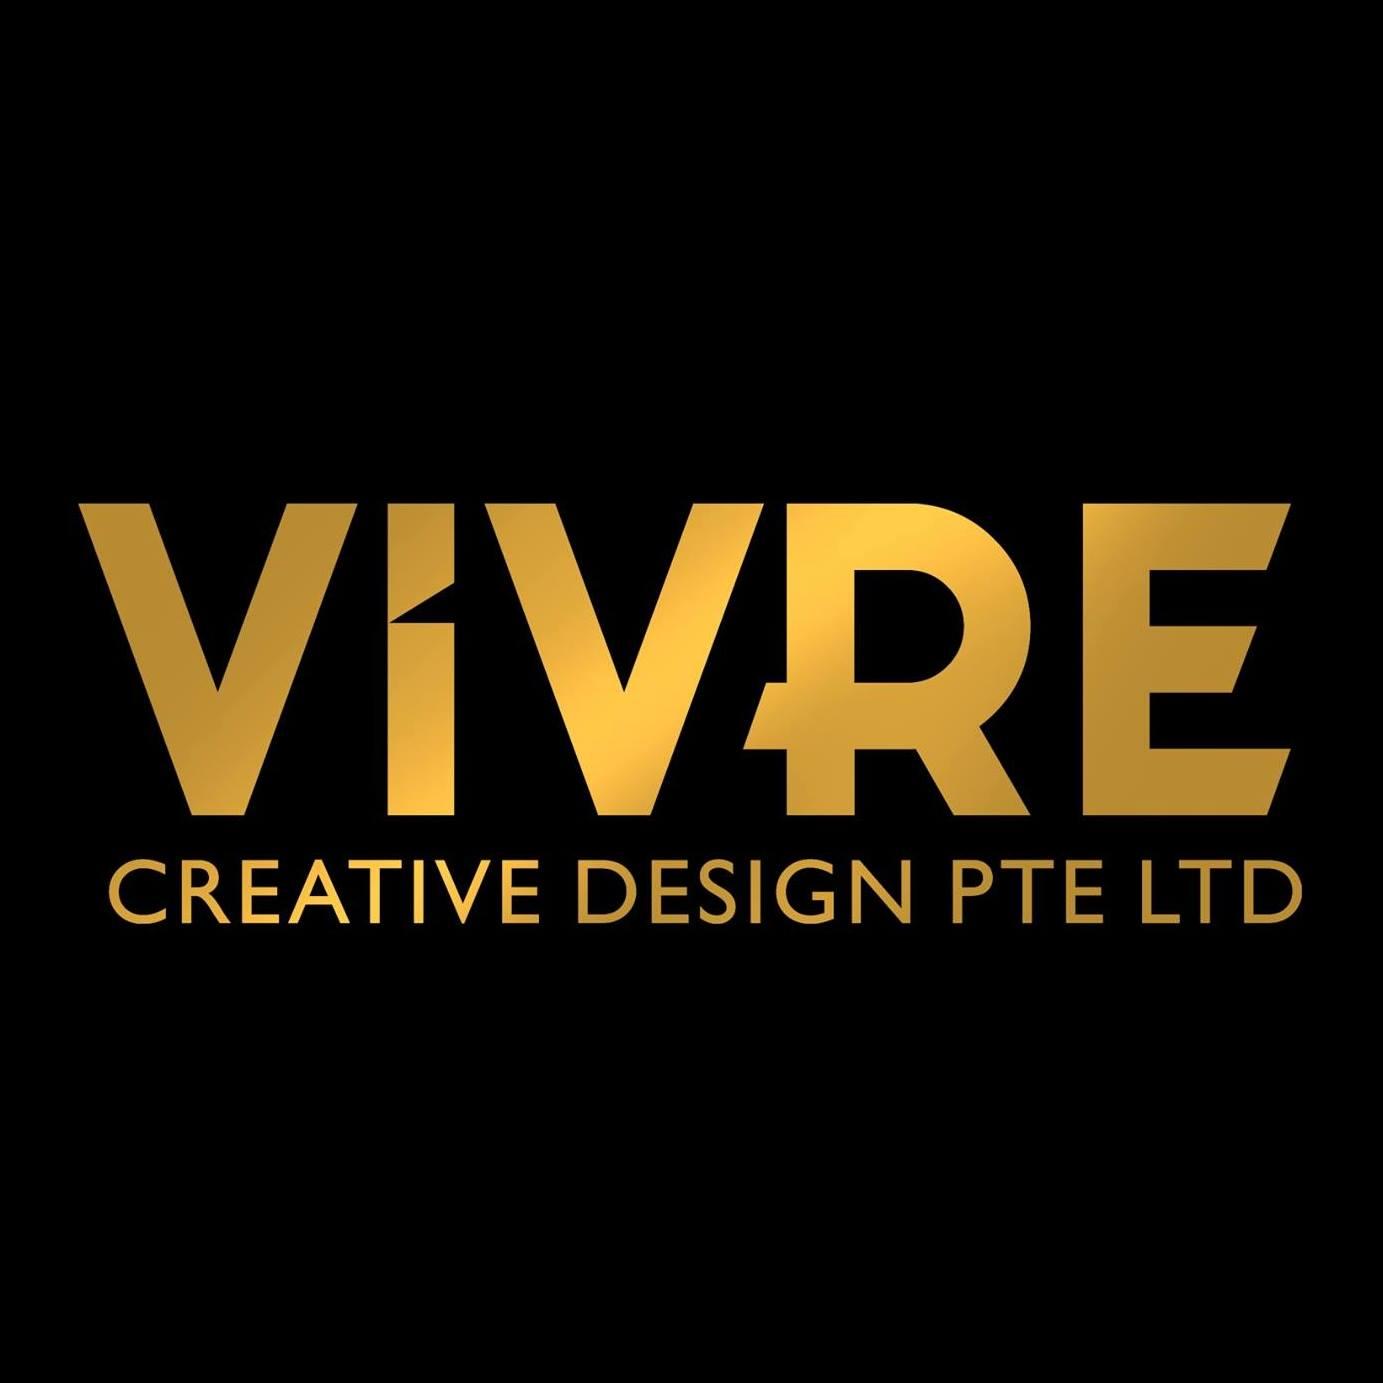 Vivre Creative Design